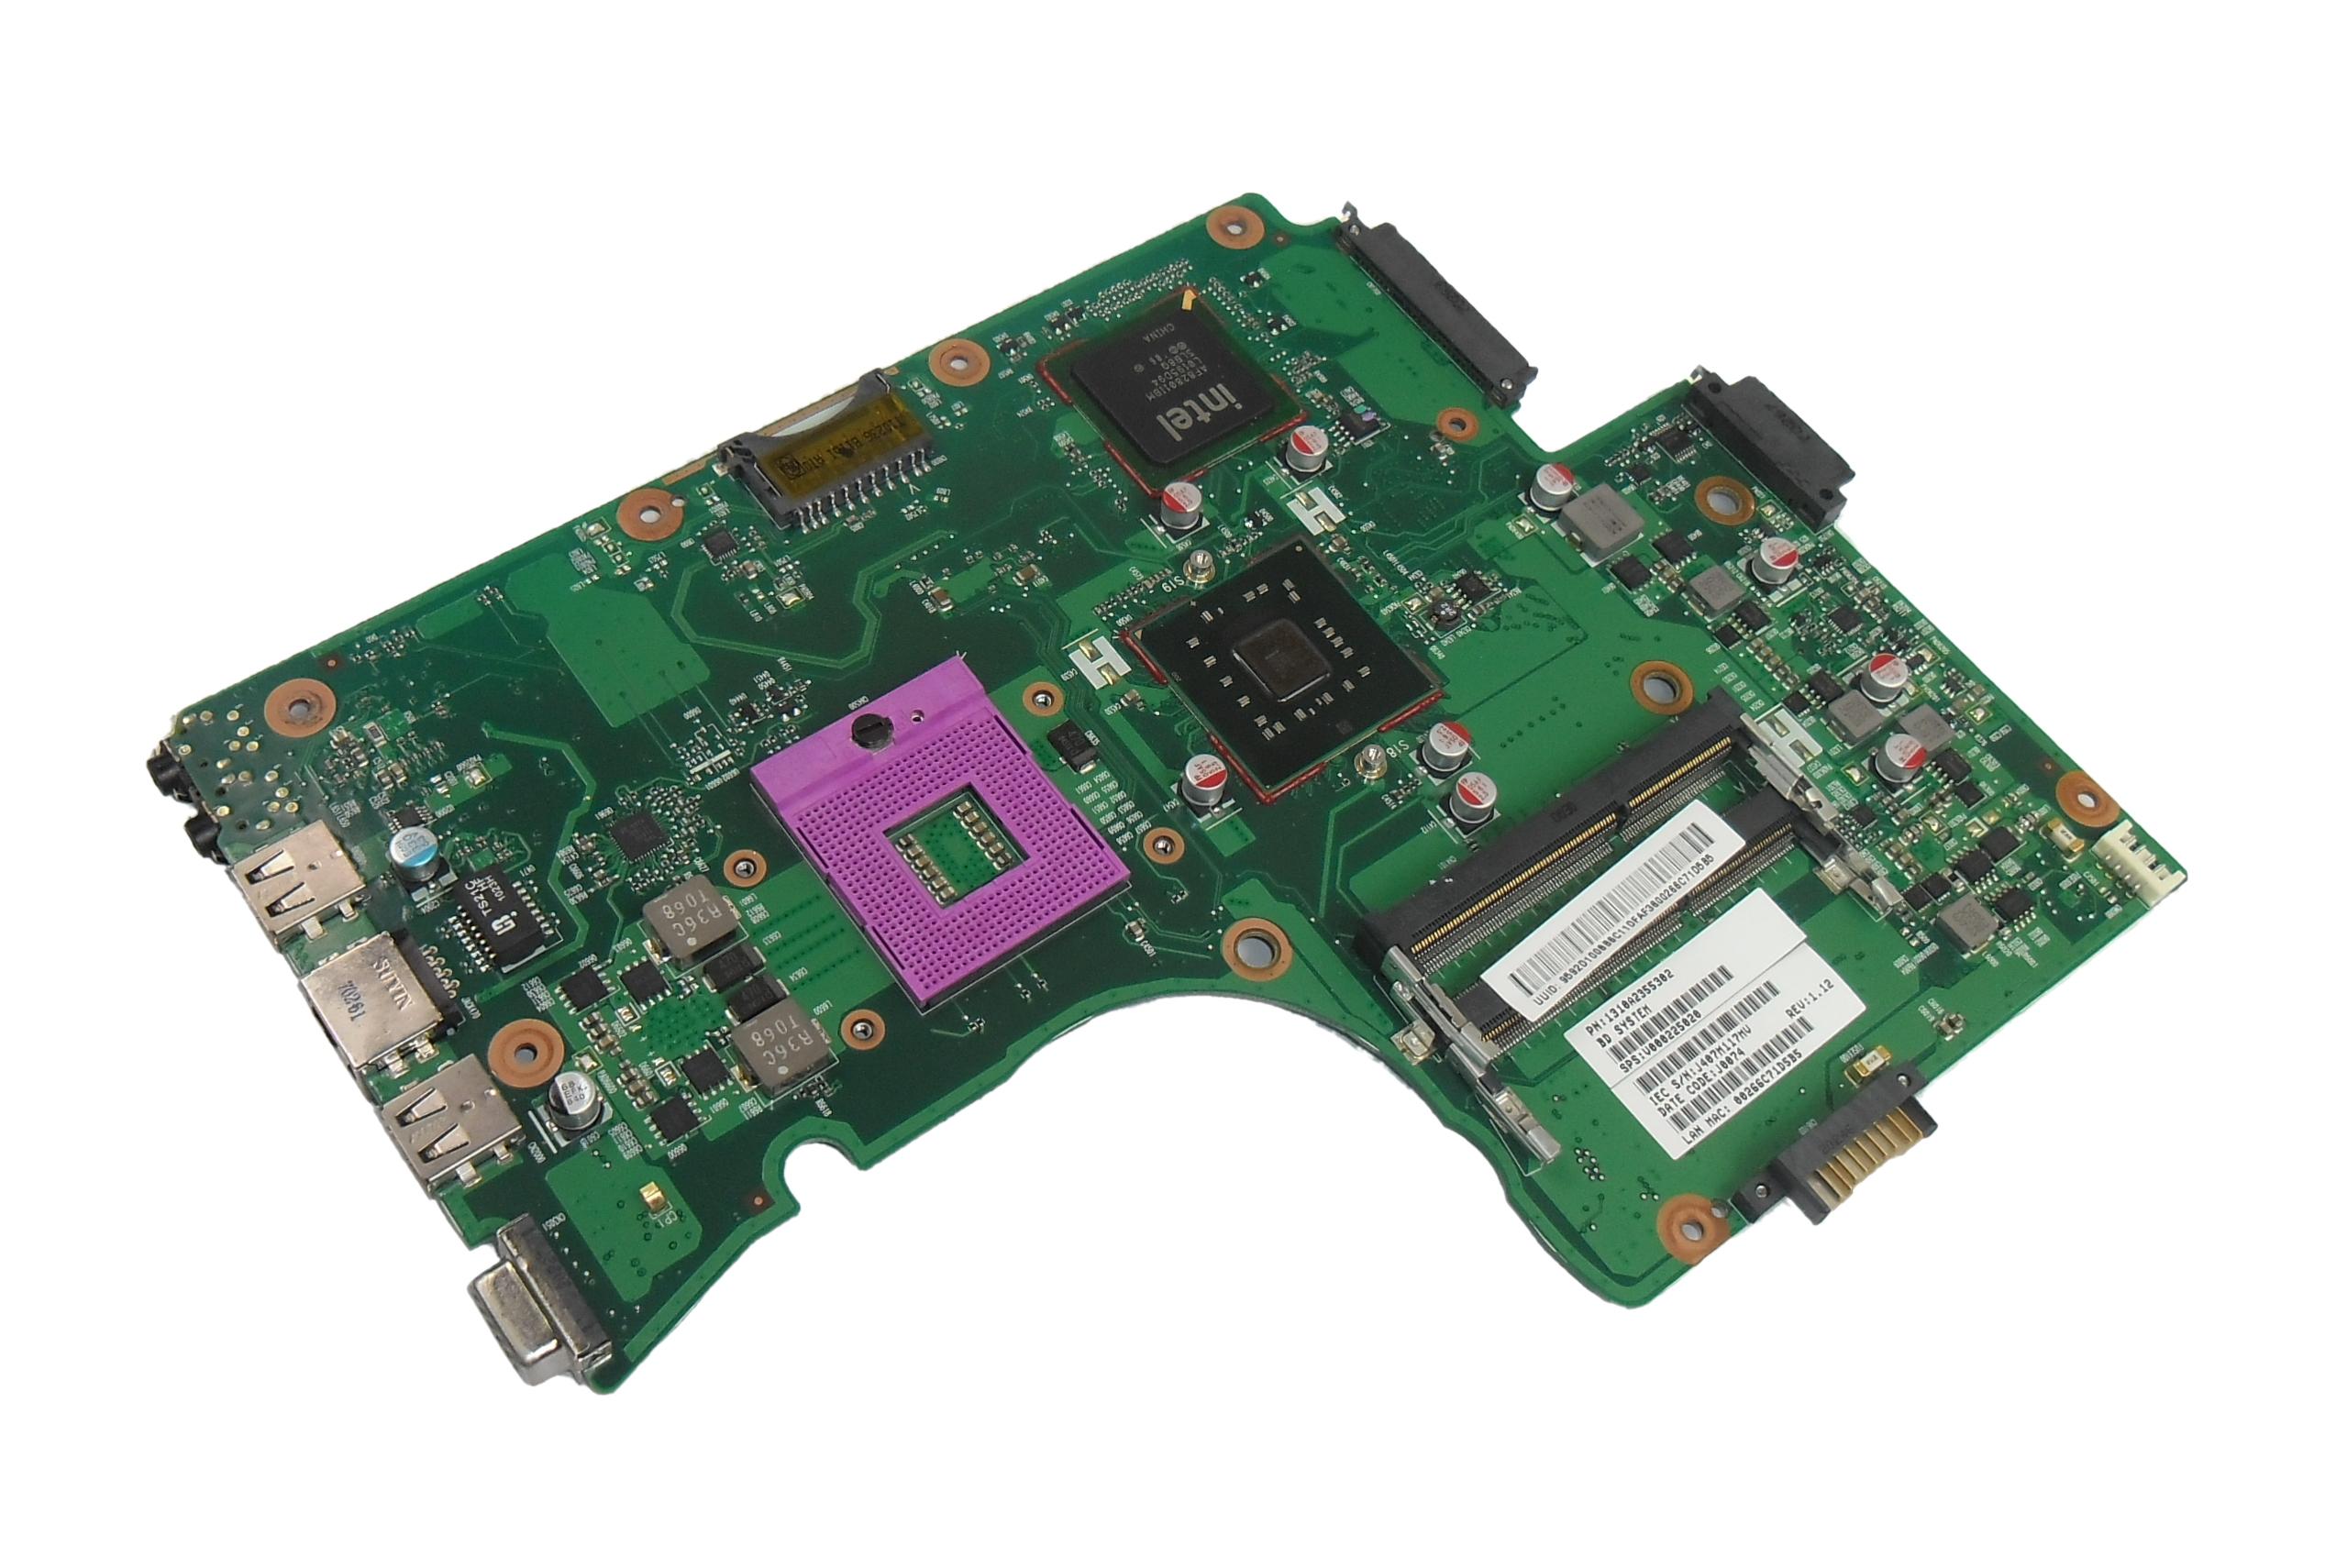 V000225020 Toshiba Satellite C650 Laptop Motherboard / Mainboard - 1310A2355302